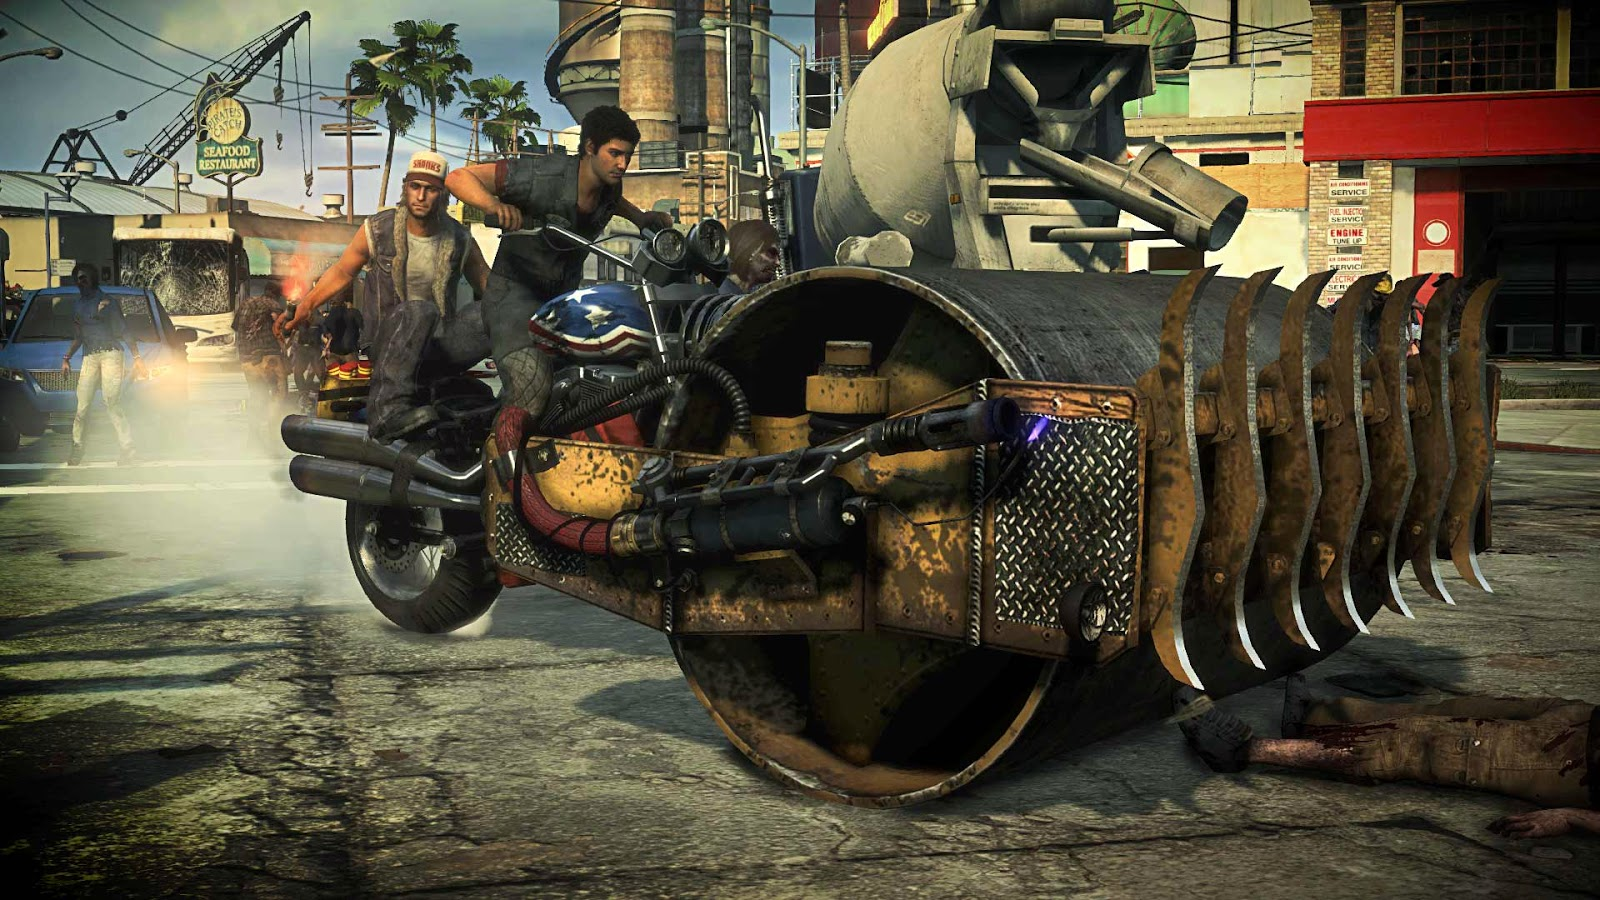 Vehiculo aplasta zombies casero multijugador